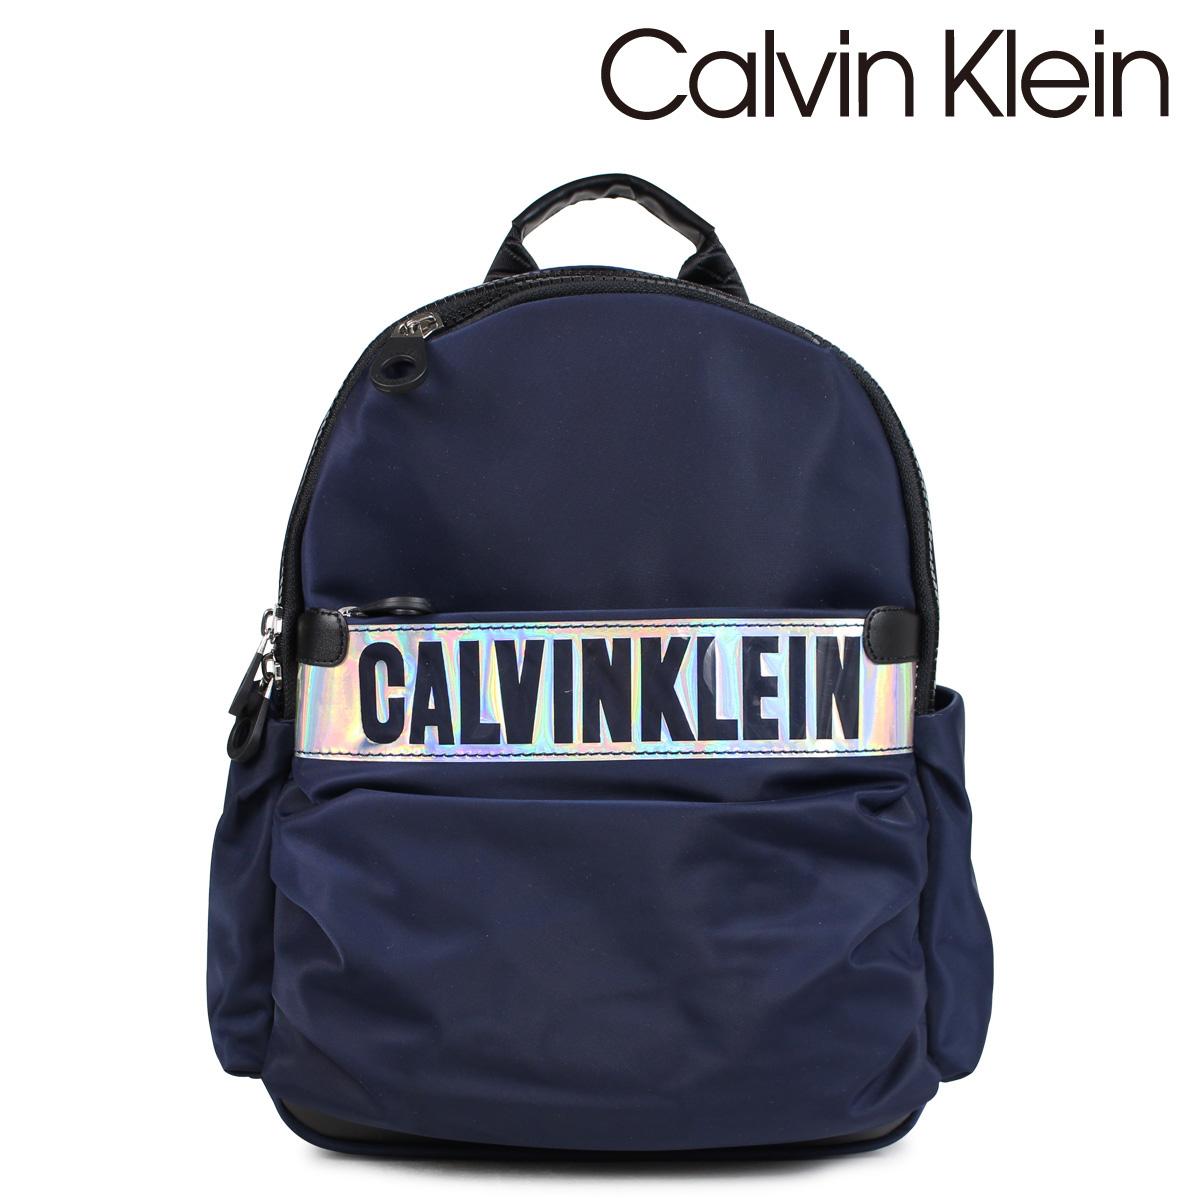 Calvin Klein ATHLEISURE LARGE BACKPACK カルバンクライン バッグ メンズ リュック バッグパック ネイビー H8AKE7YF